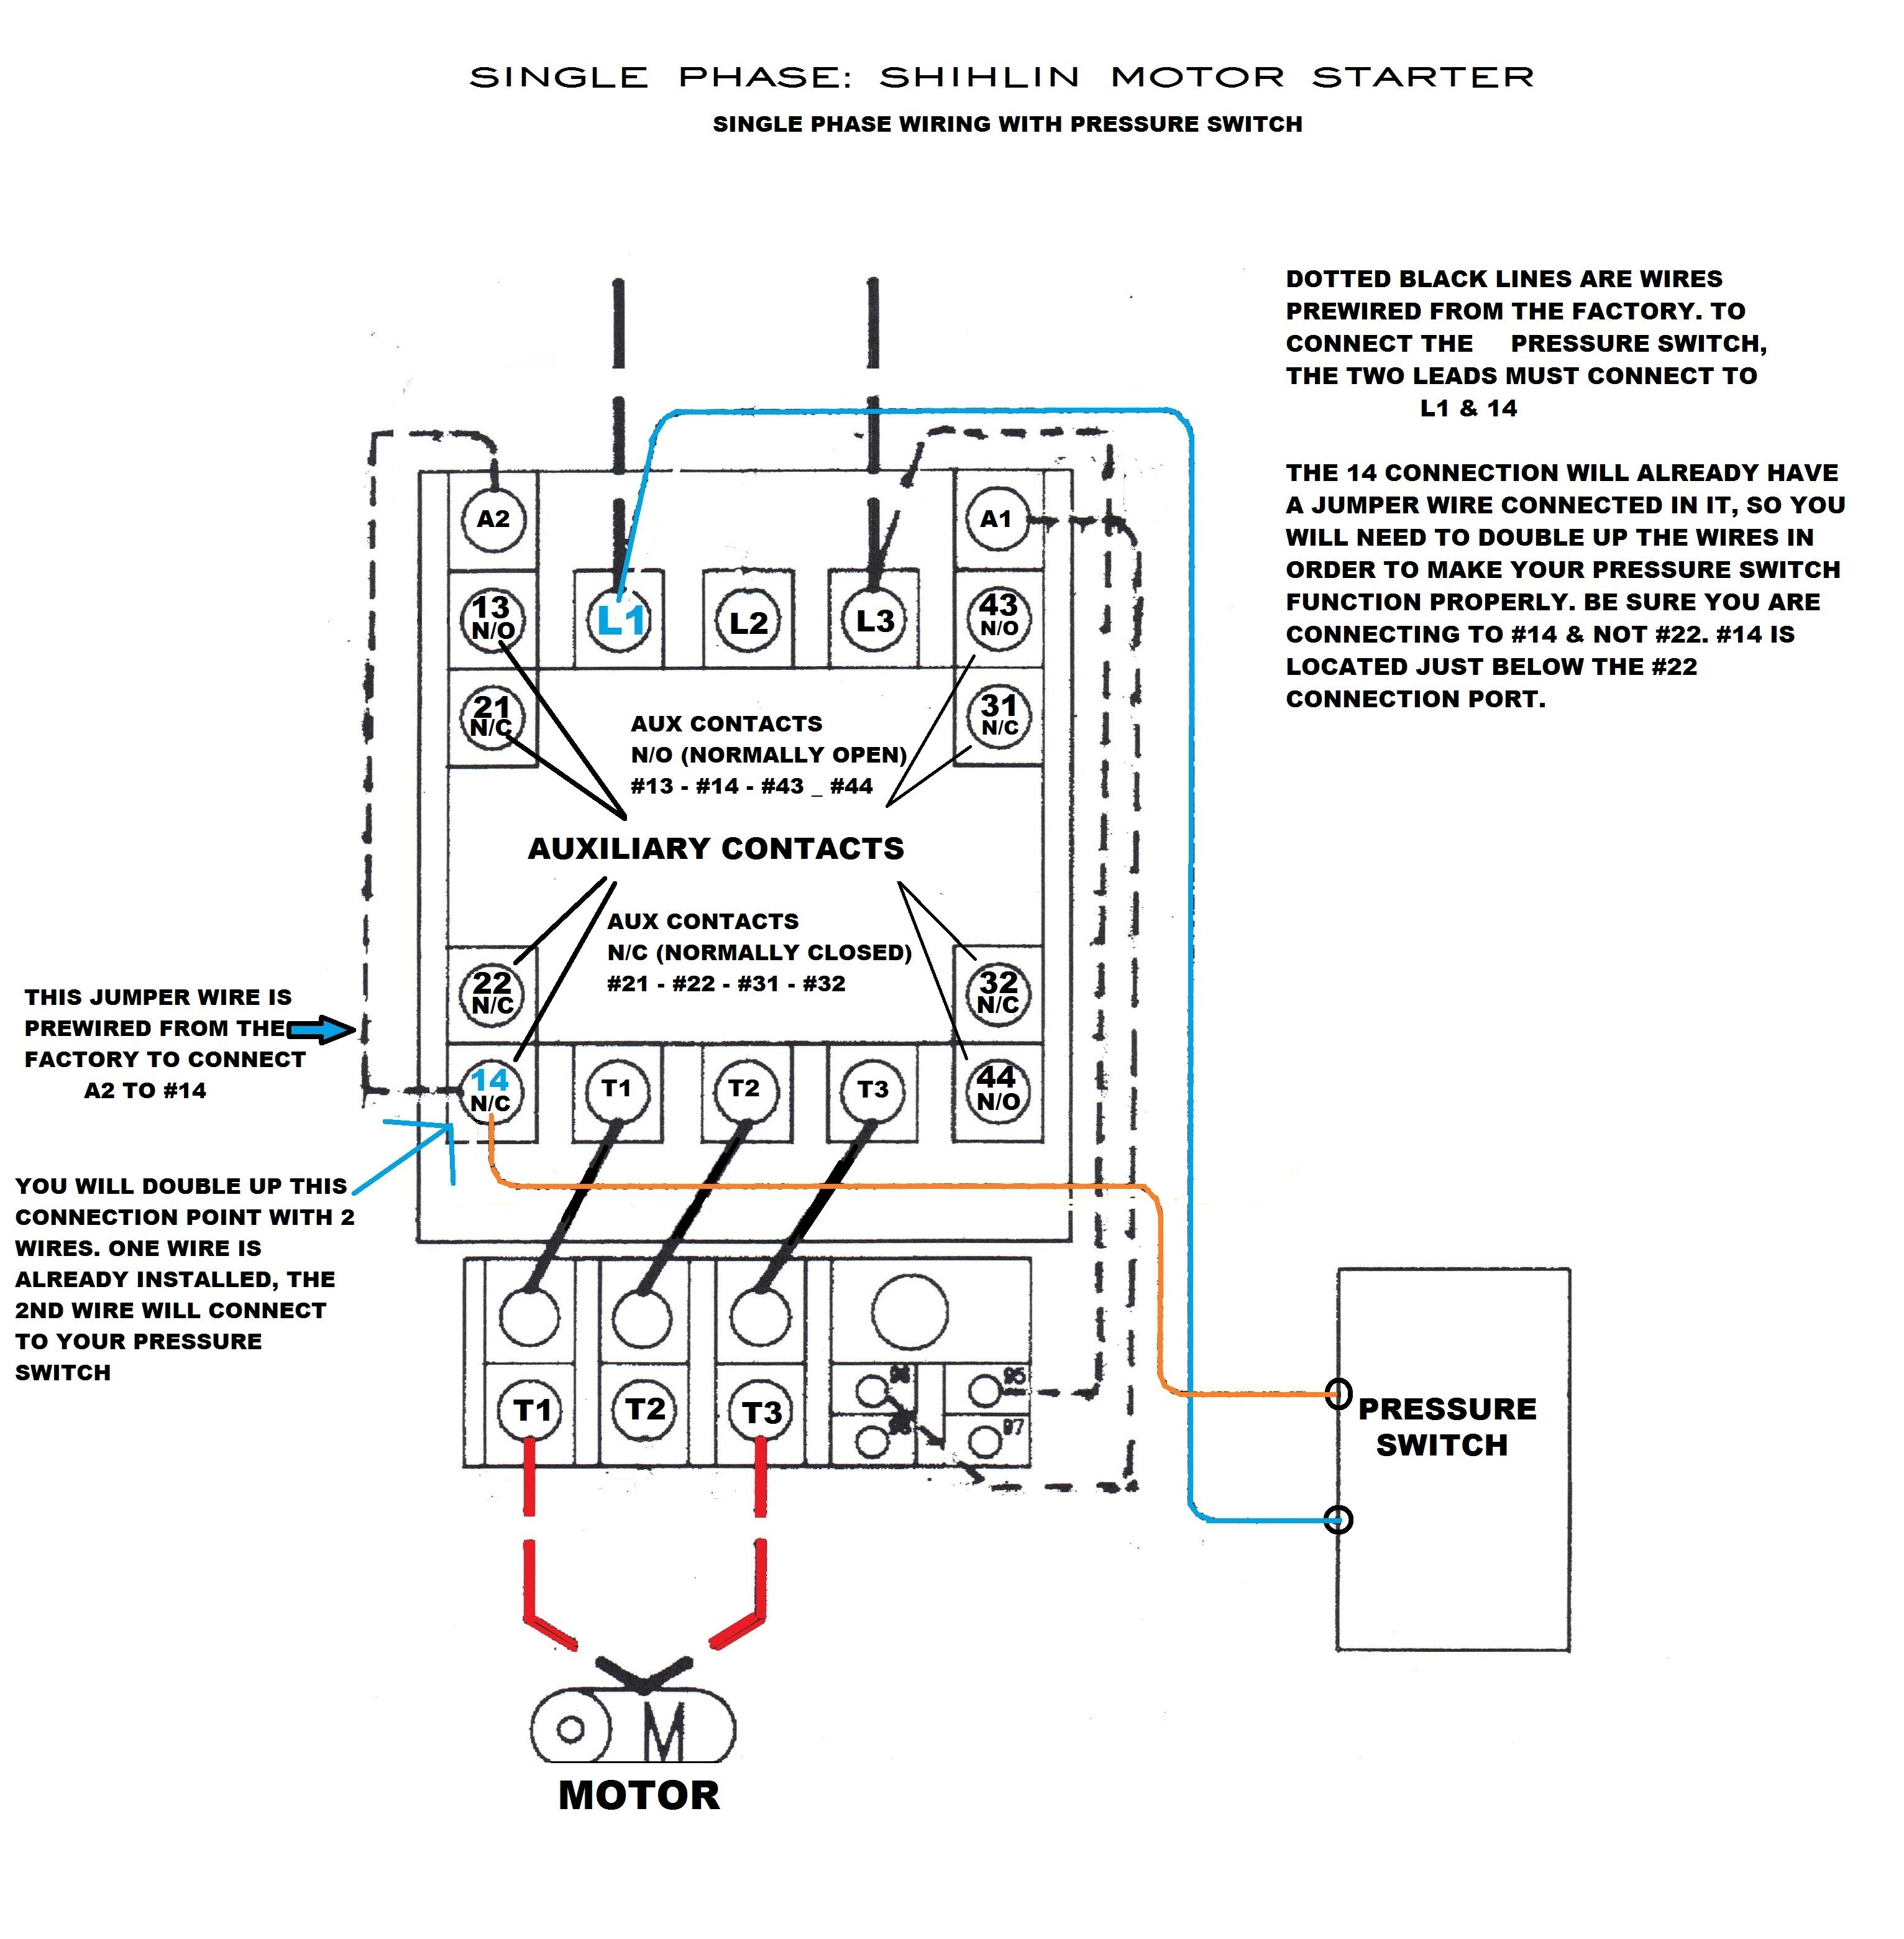 Nb 5549 Rtd Phase Motor Wiring Diagrams Moreover Siemens Wiring Diagram Also Download Diagram